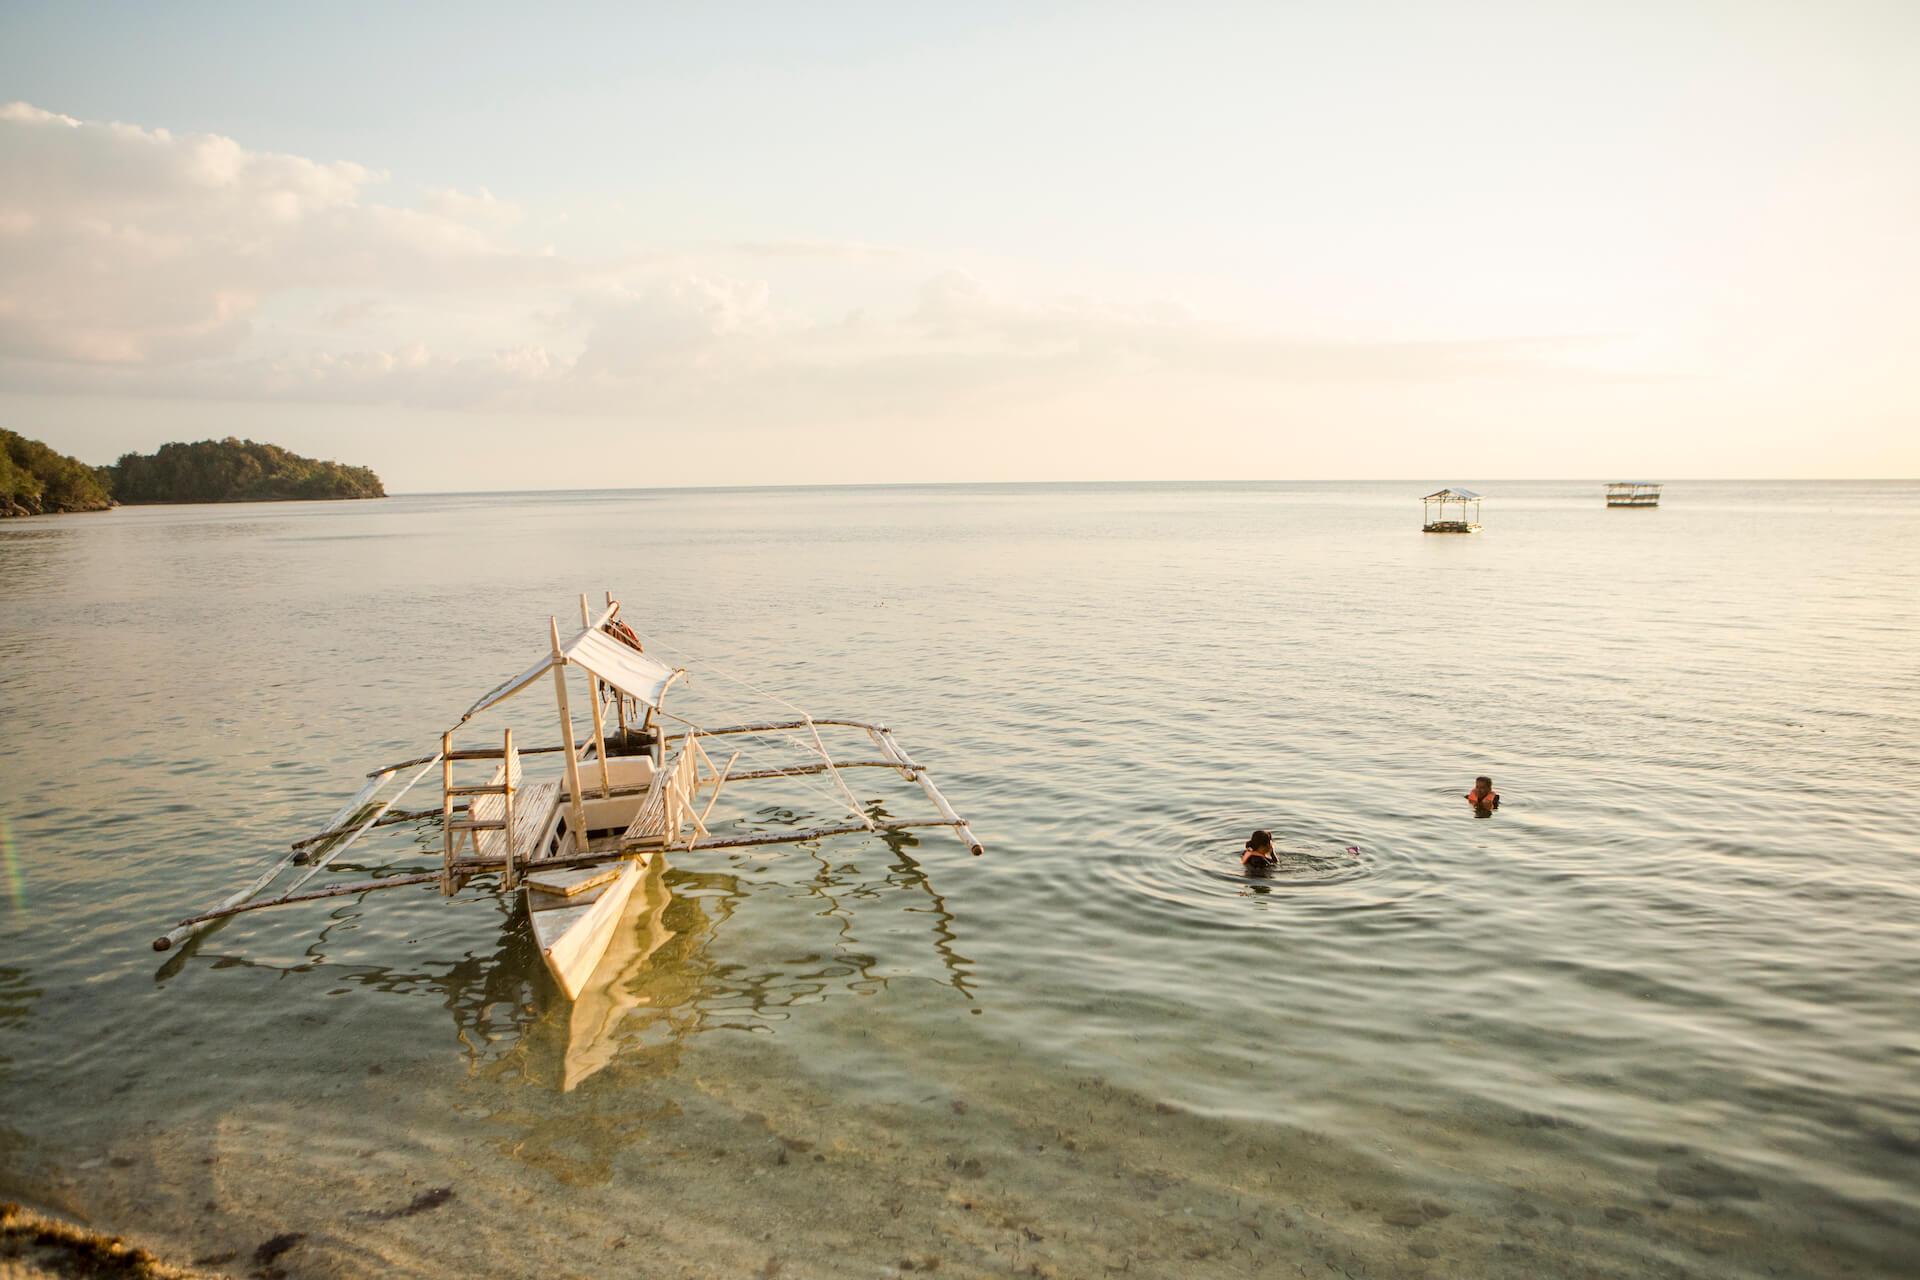 A boat on Danjugan's shore, photo by Geric Cruz